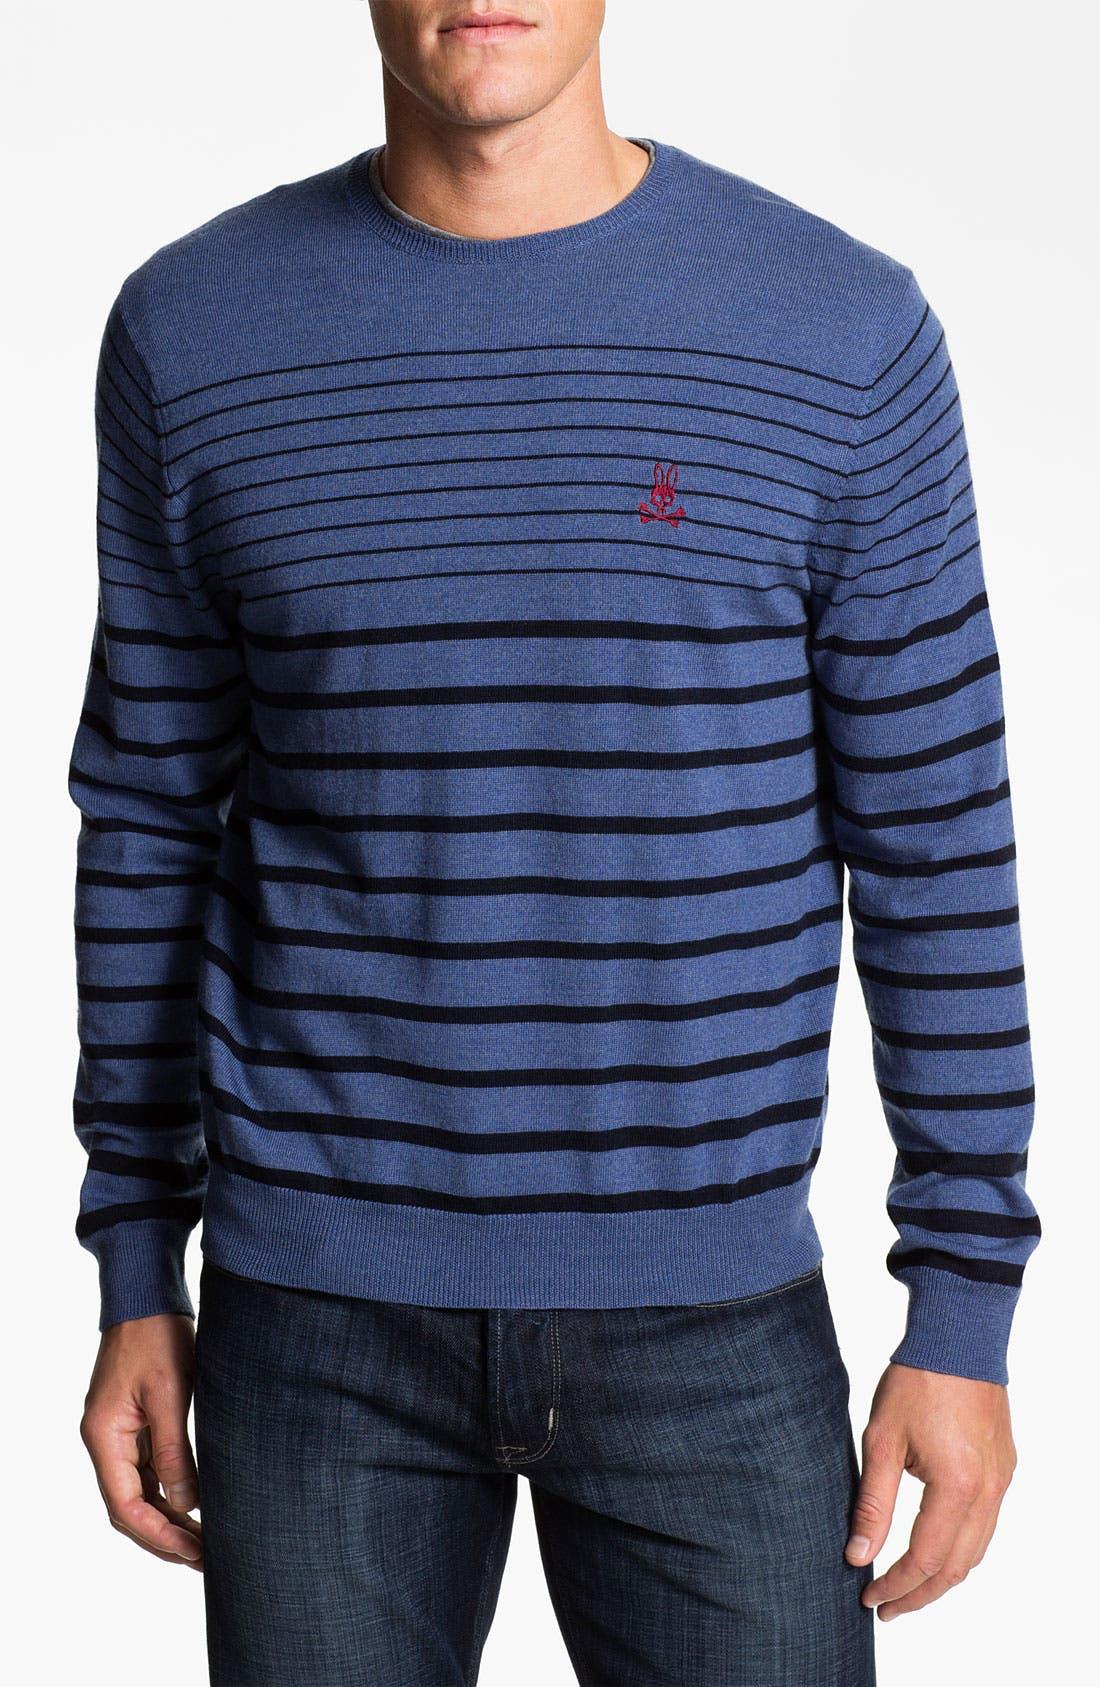 Main Image - Psycho Bunny Stripe Merino Wool Sweater